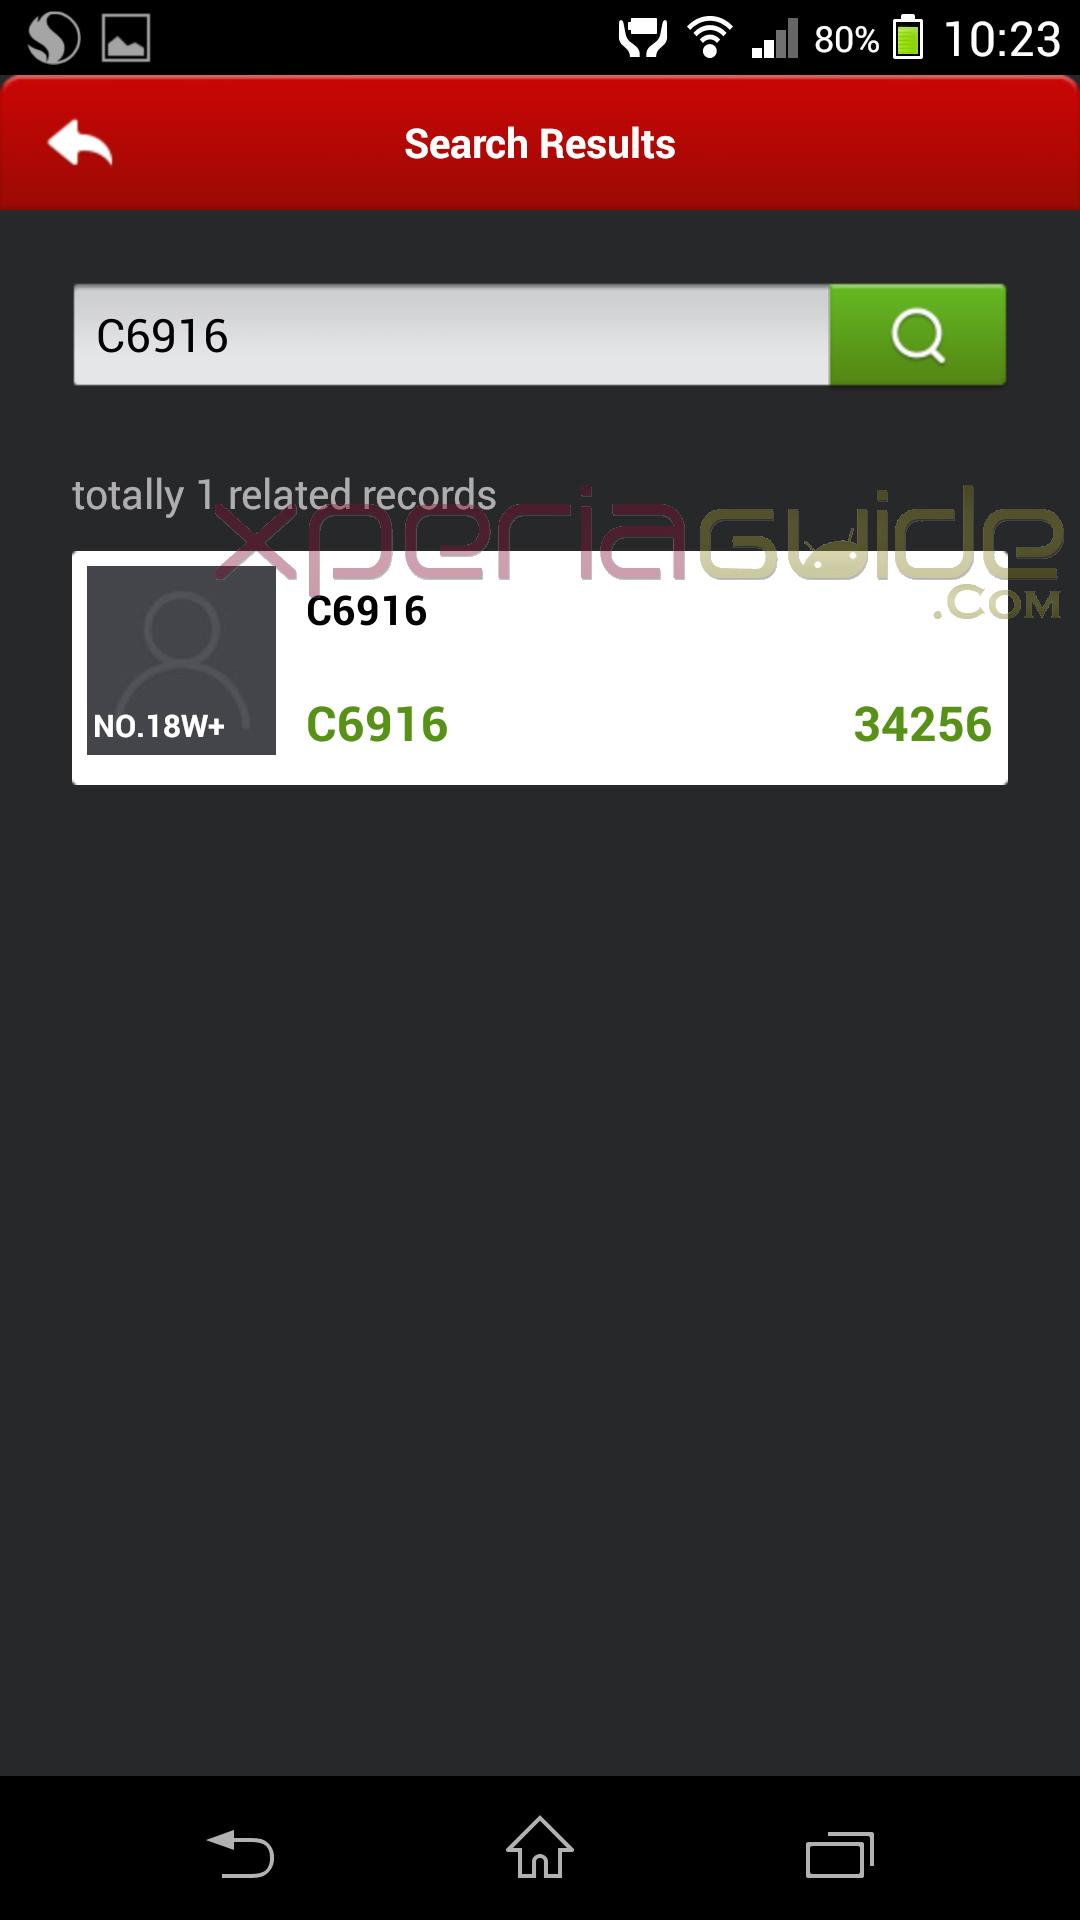 Xperia C6916 Benchmark Scores T Mobile LTE xperia Z1